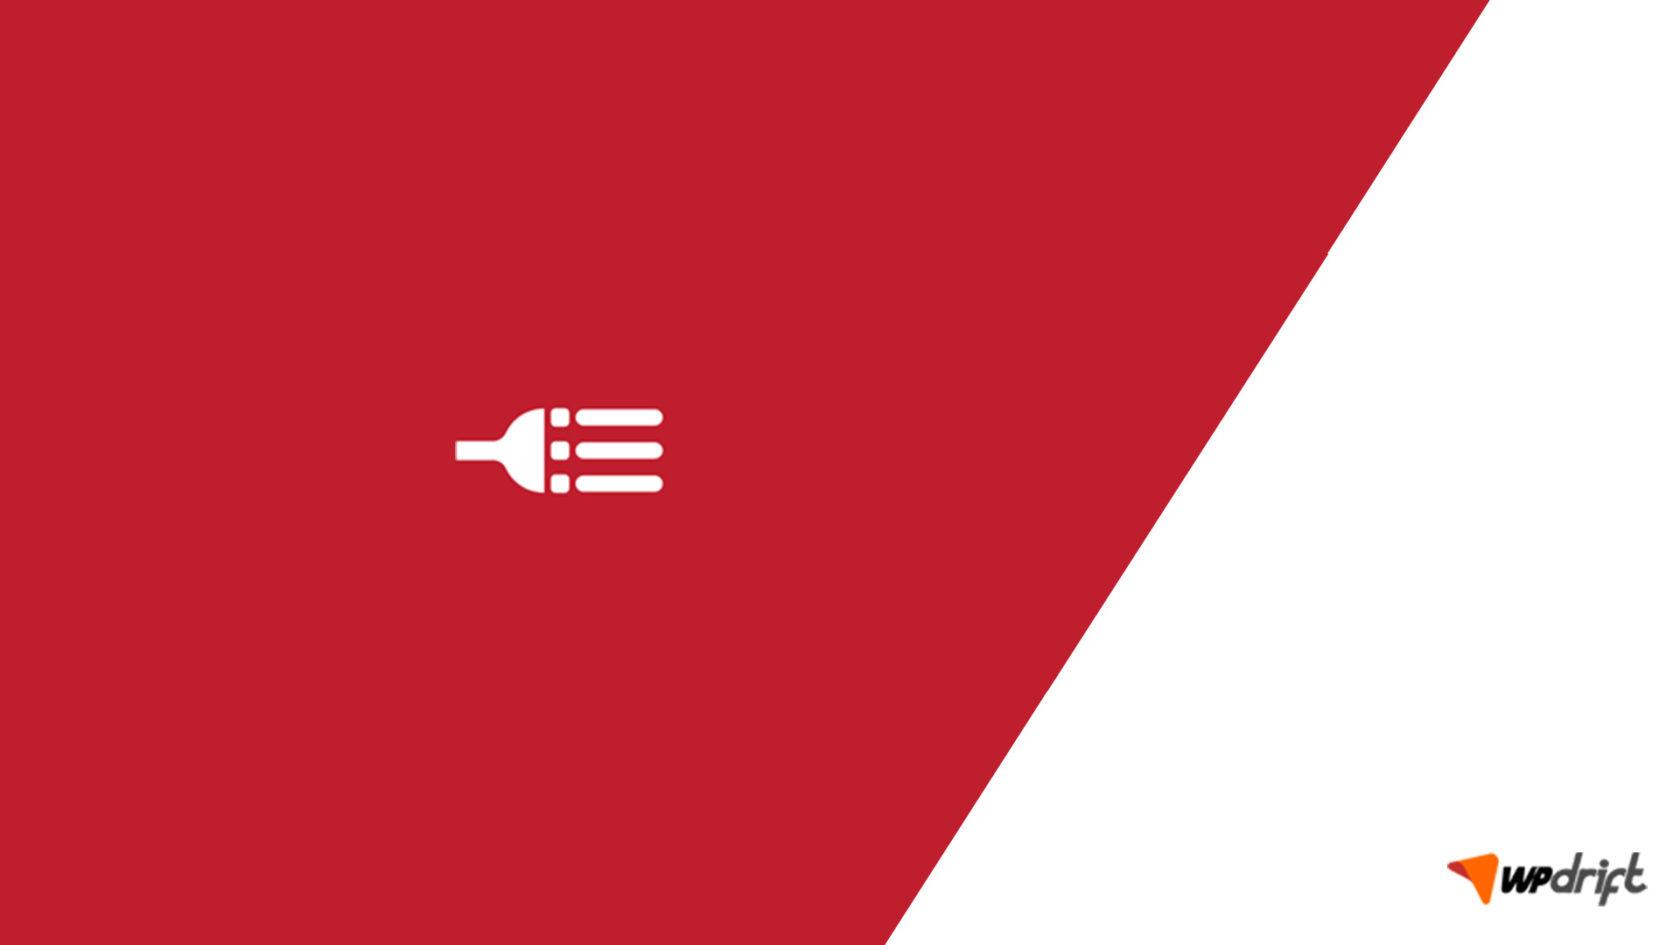 WP Restaurant Listings Review by WPdrift